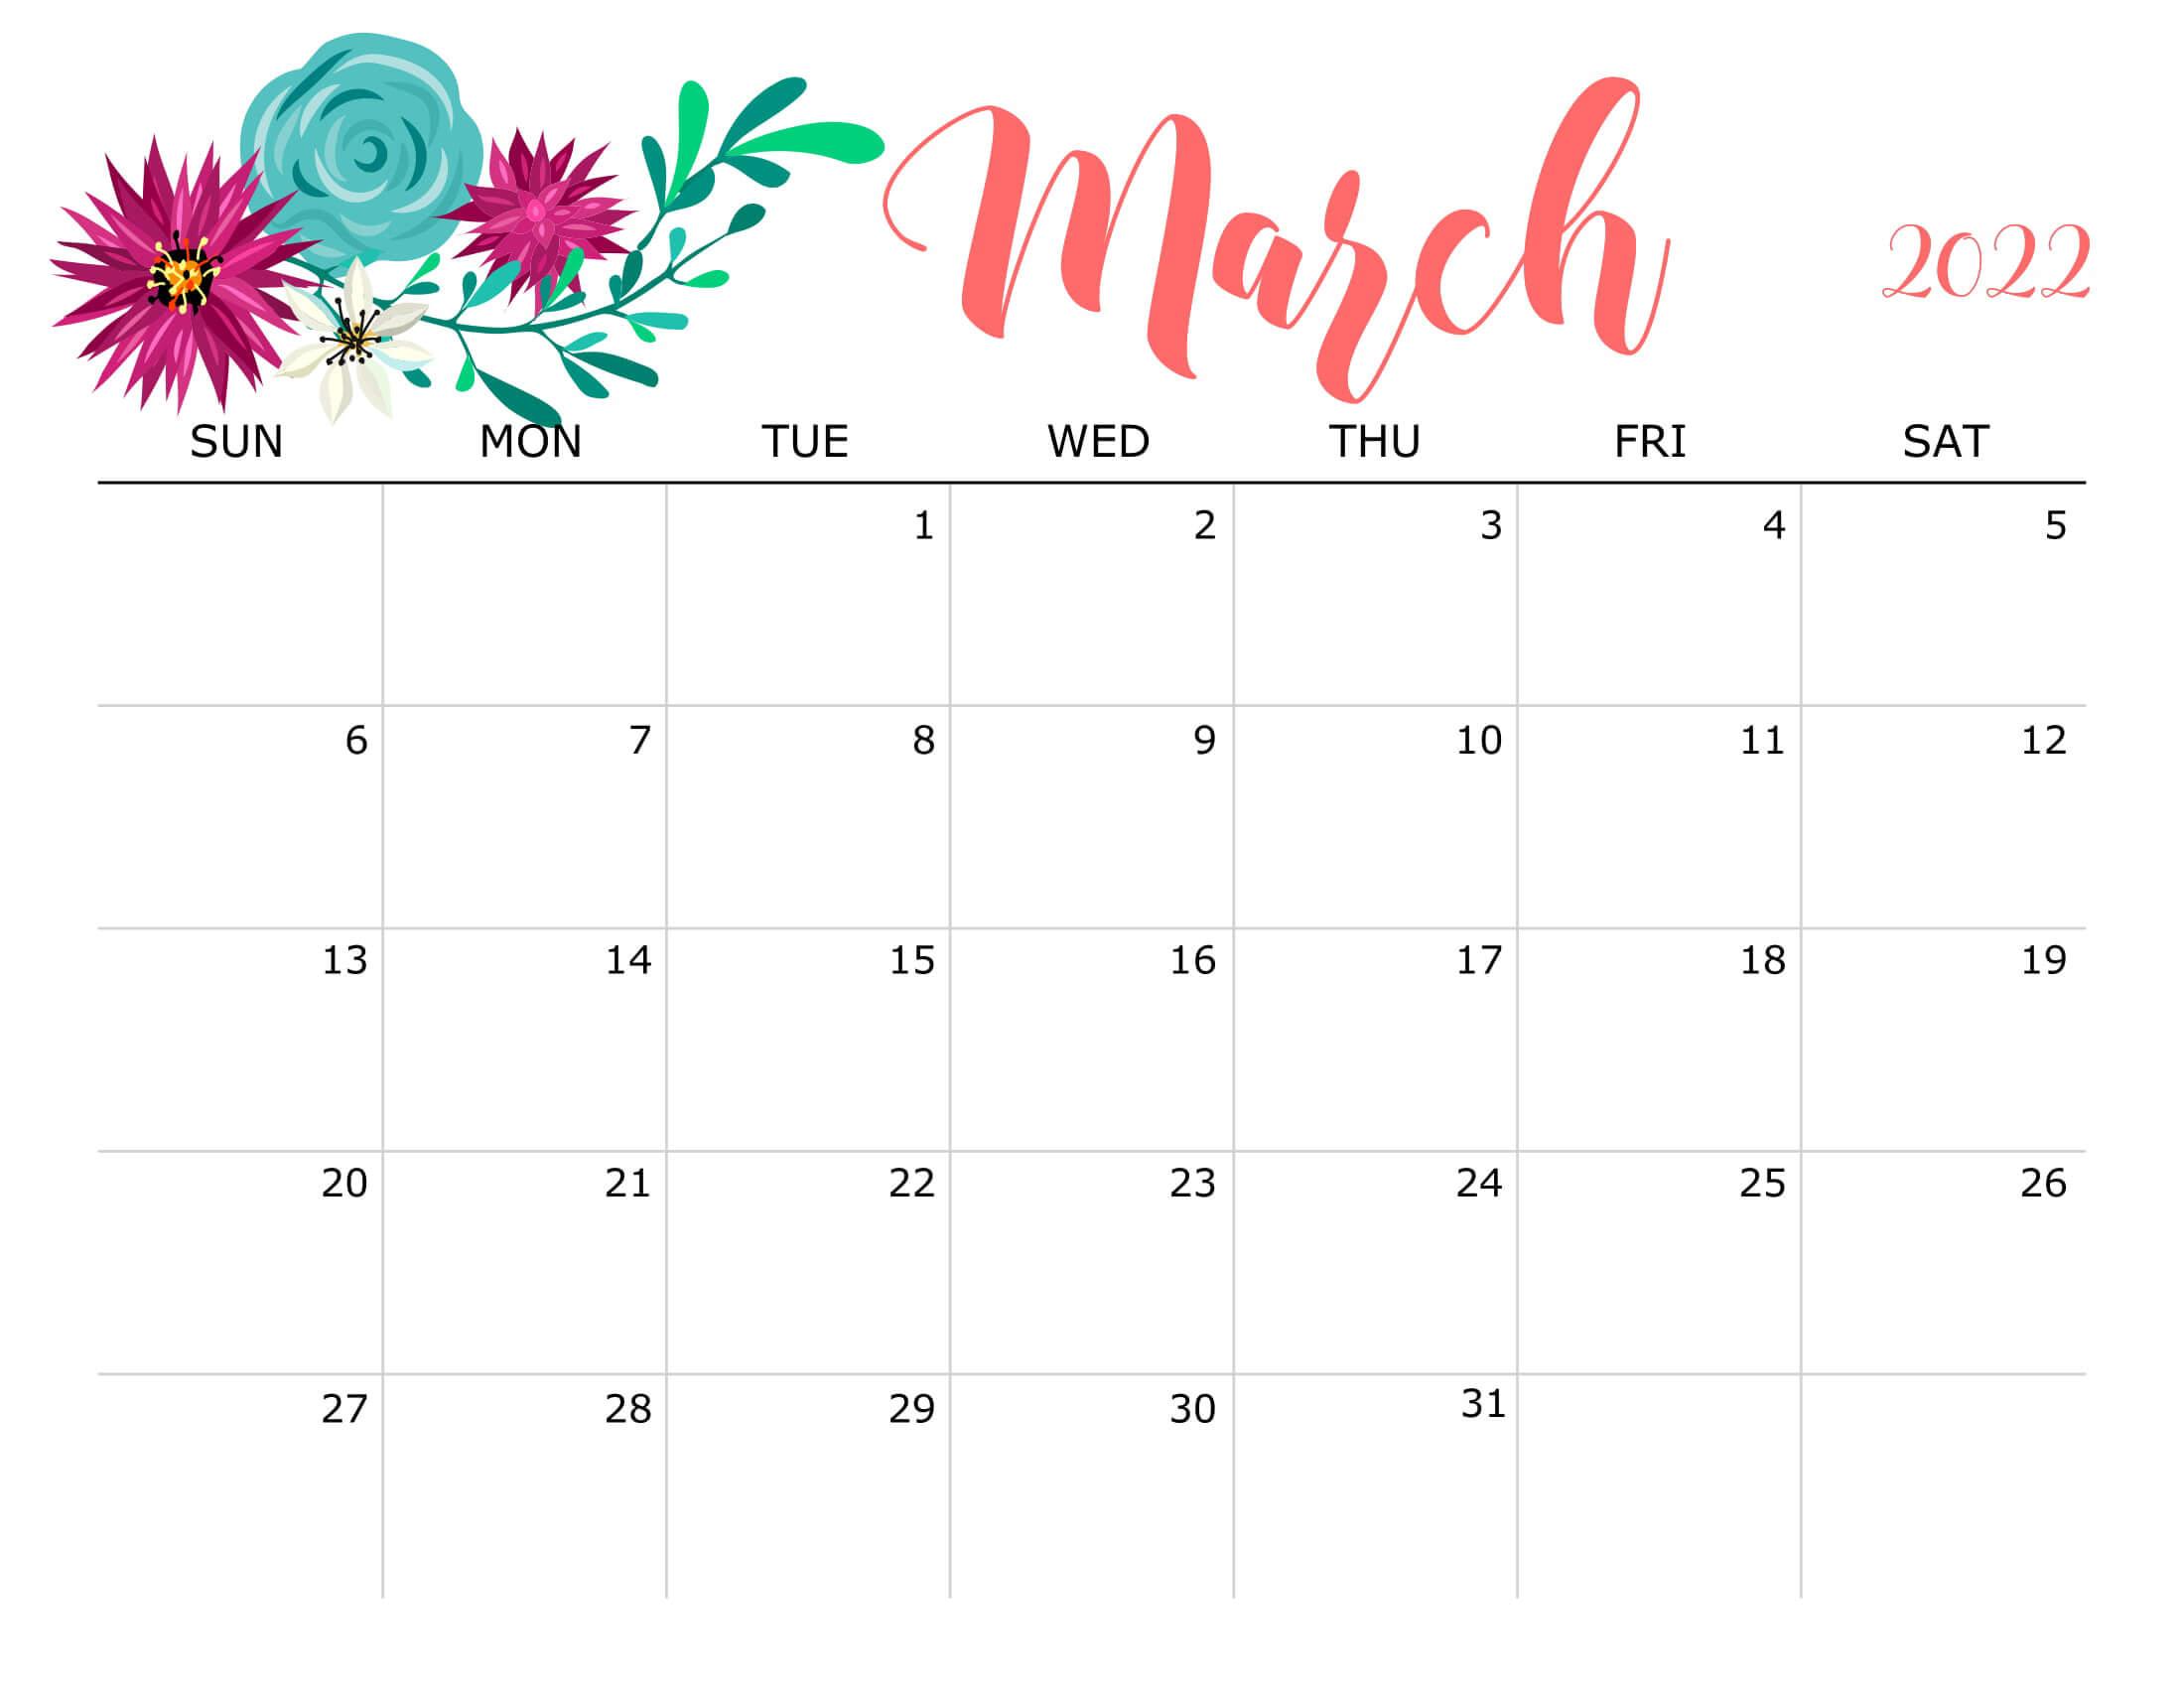 Floral March 2022 Calendar